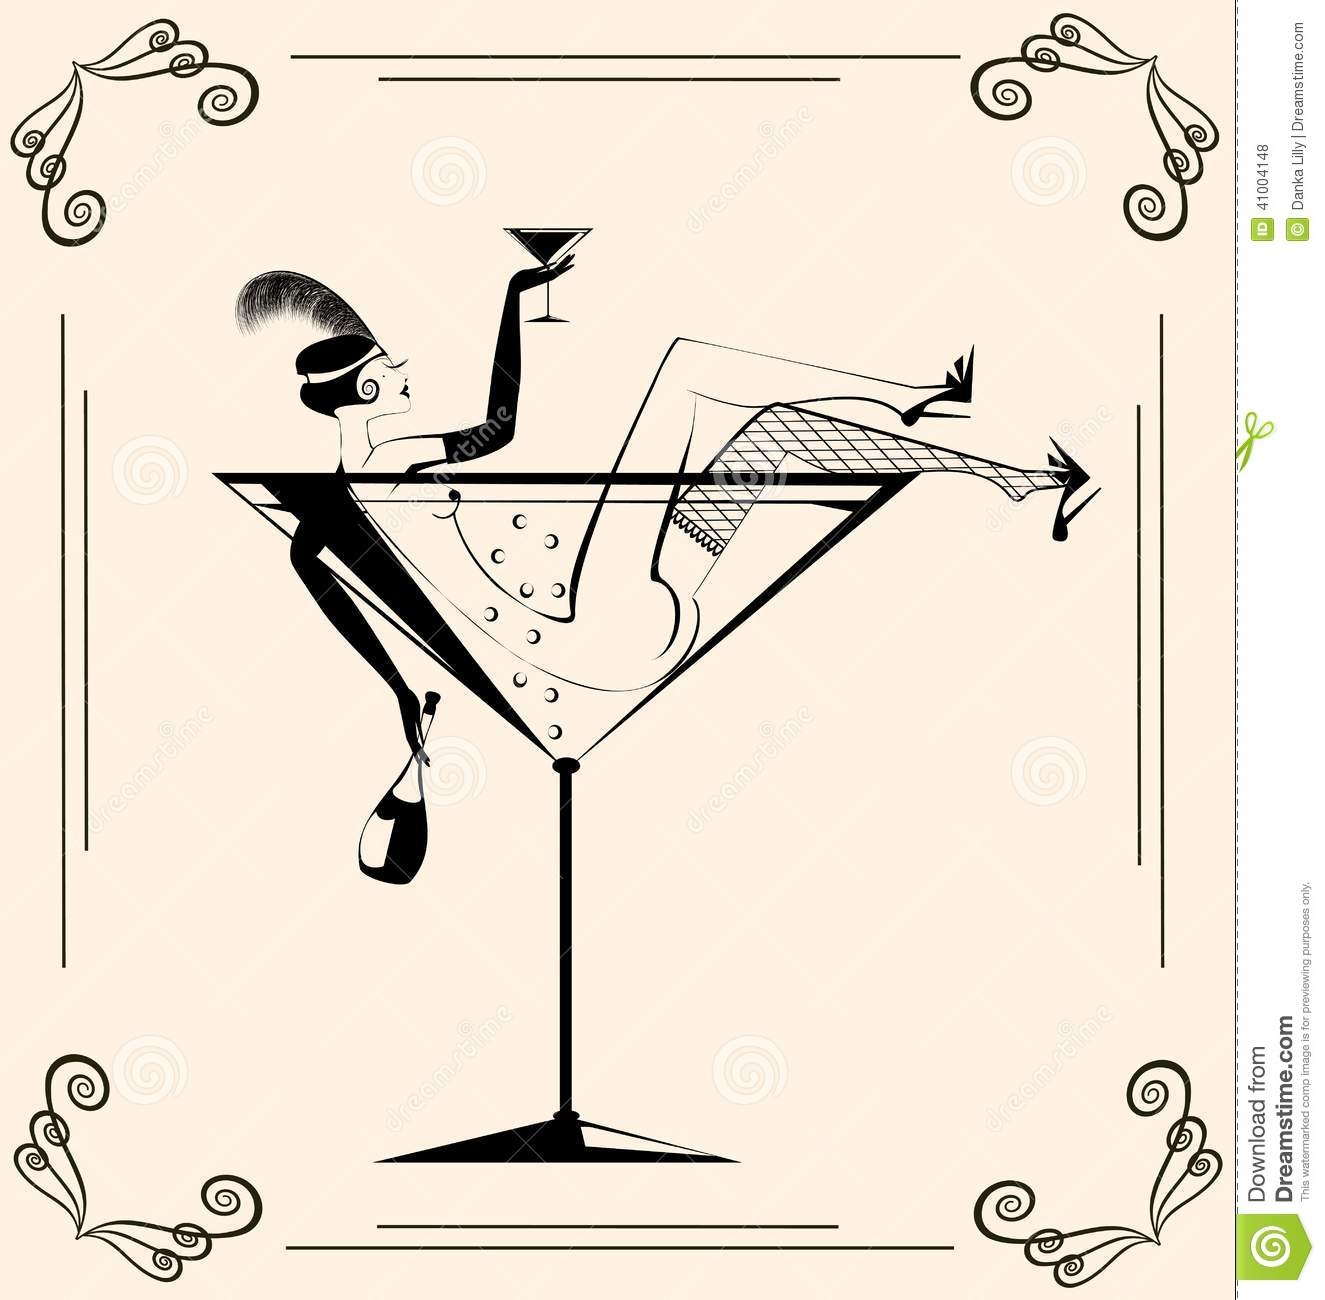 Frau im cocktailglas clipart transparent download Frau im cocktailglas clipart - ClipartFest transparent download